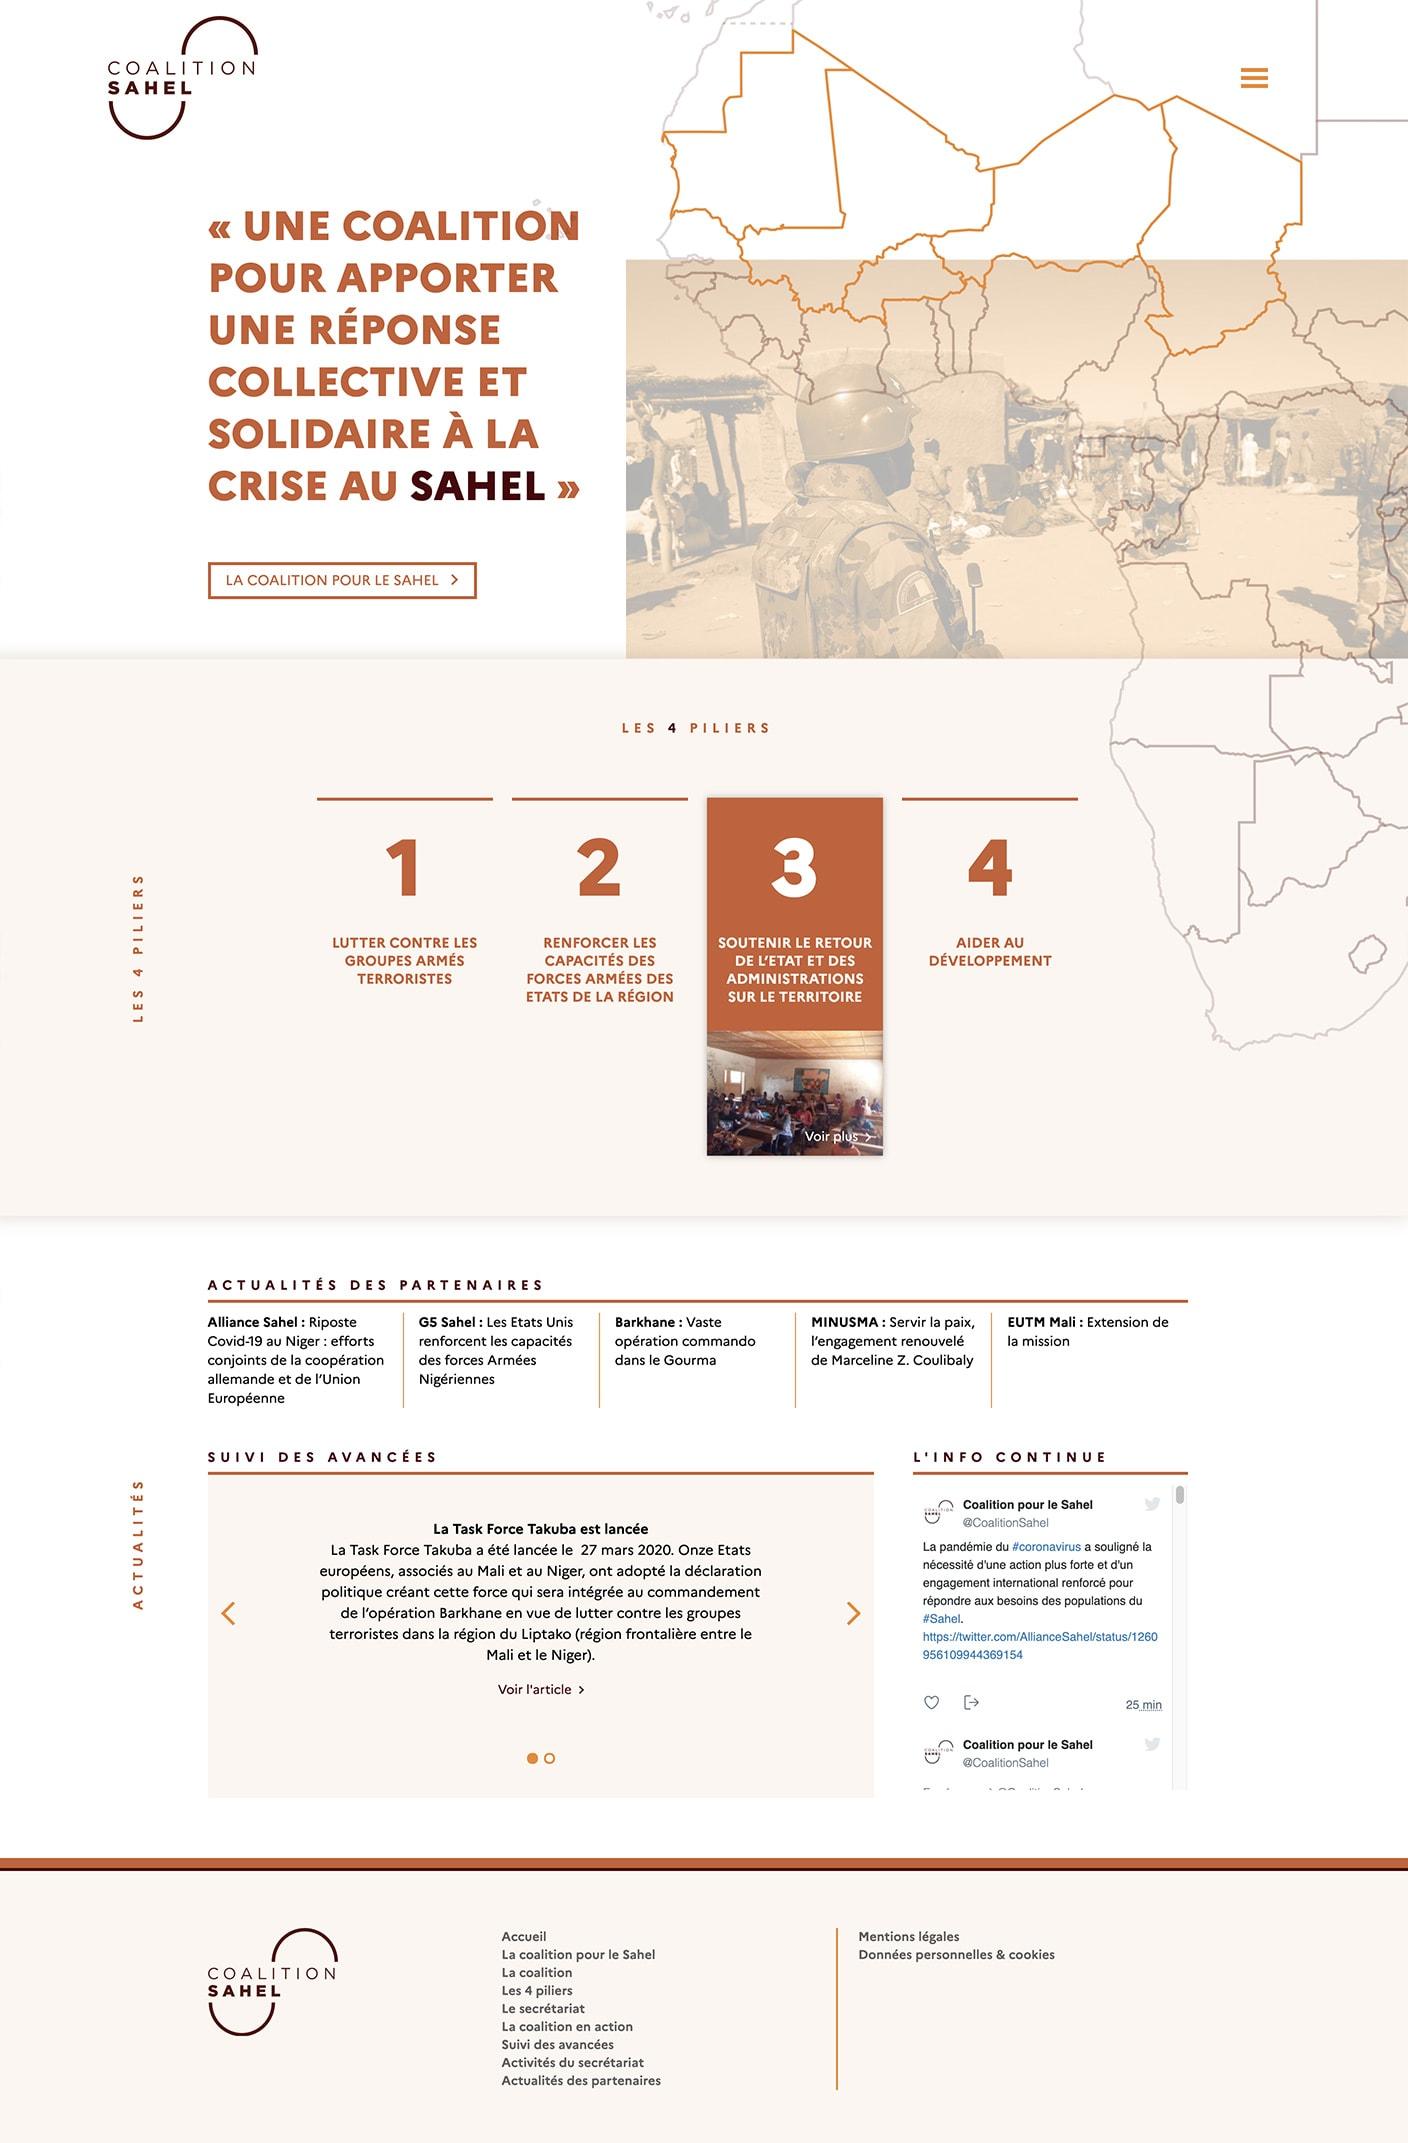 Ecran 1 du site Coalition Sahel